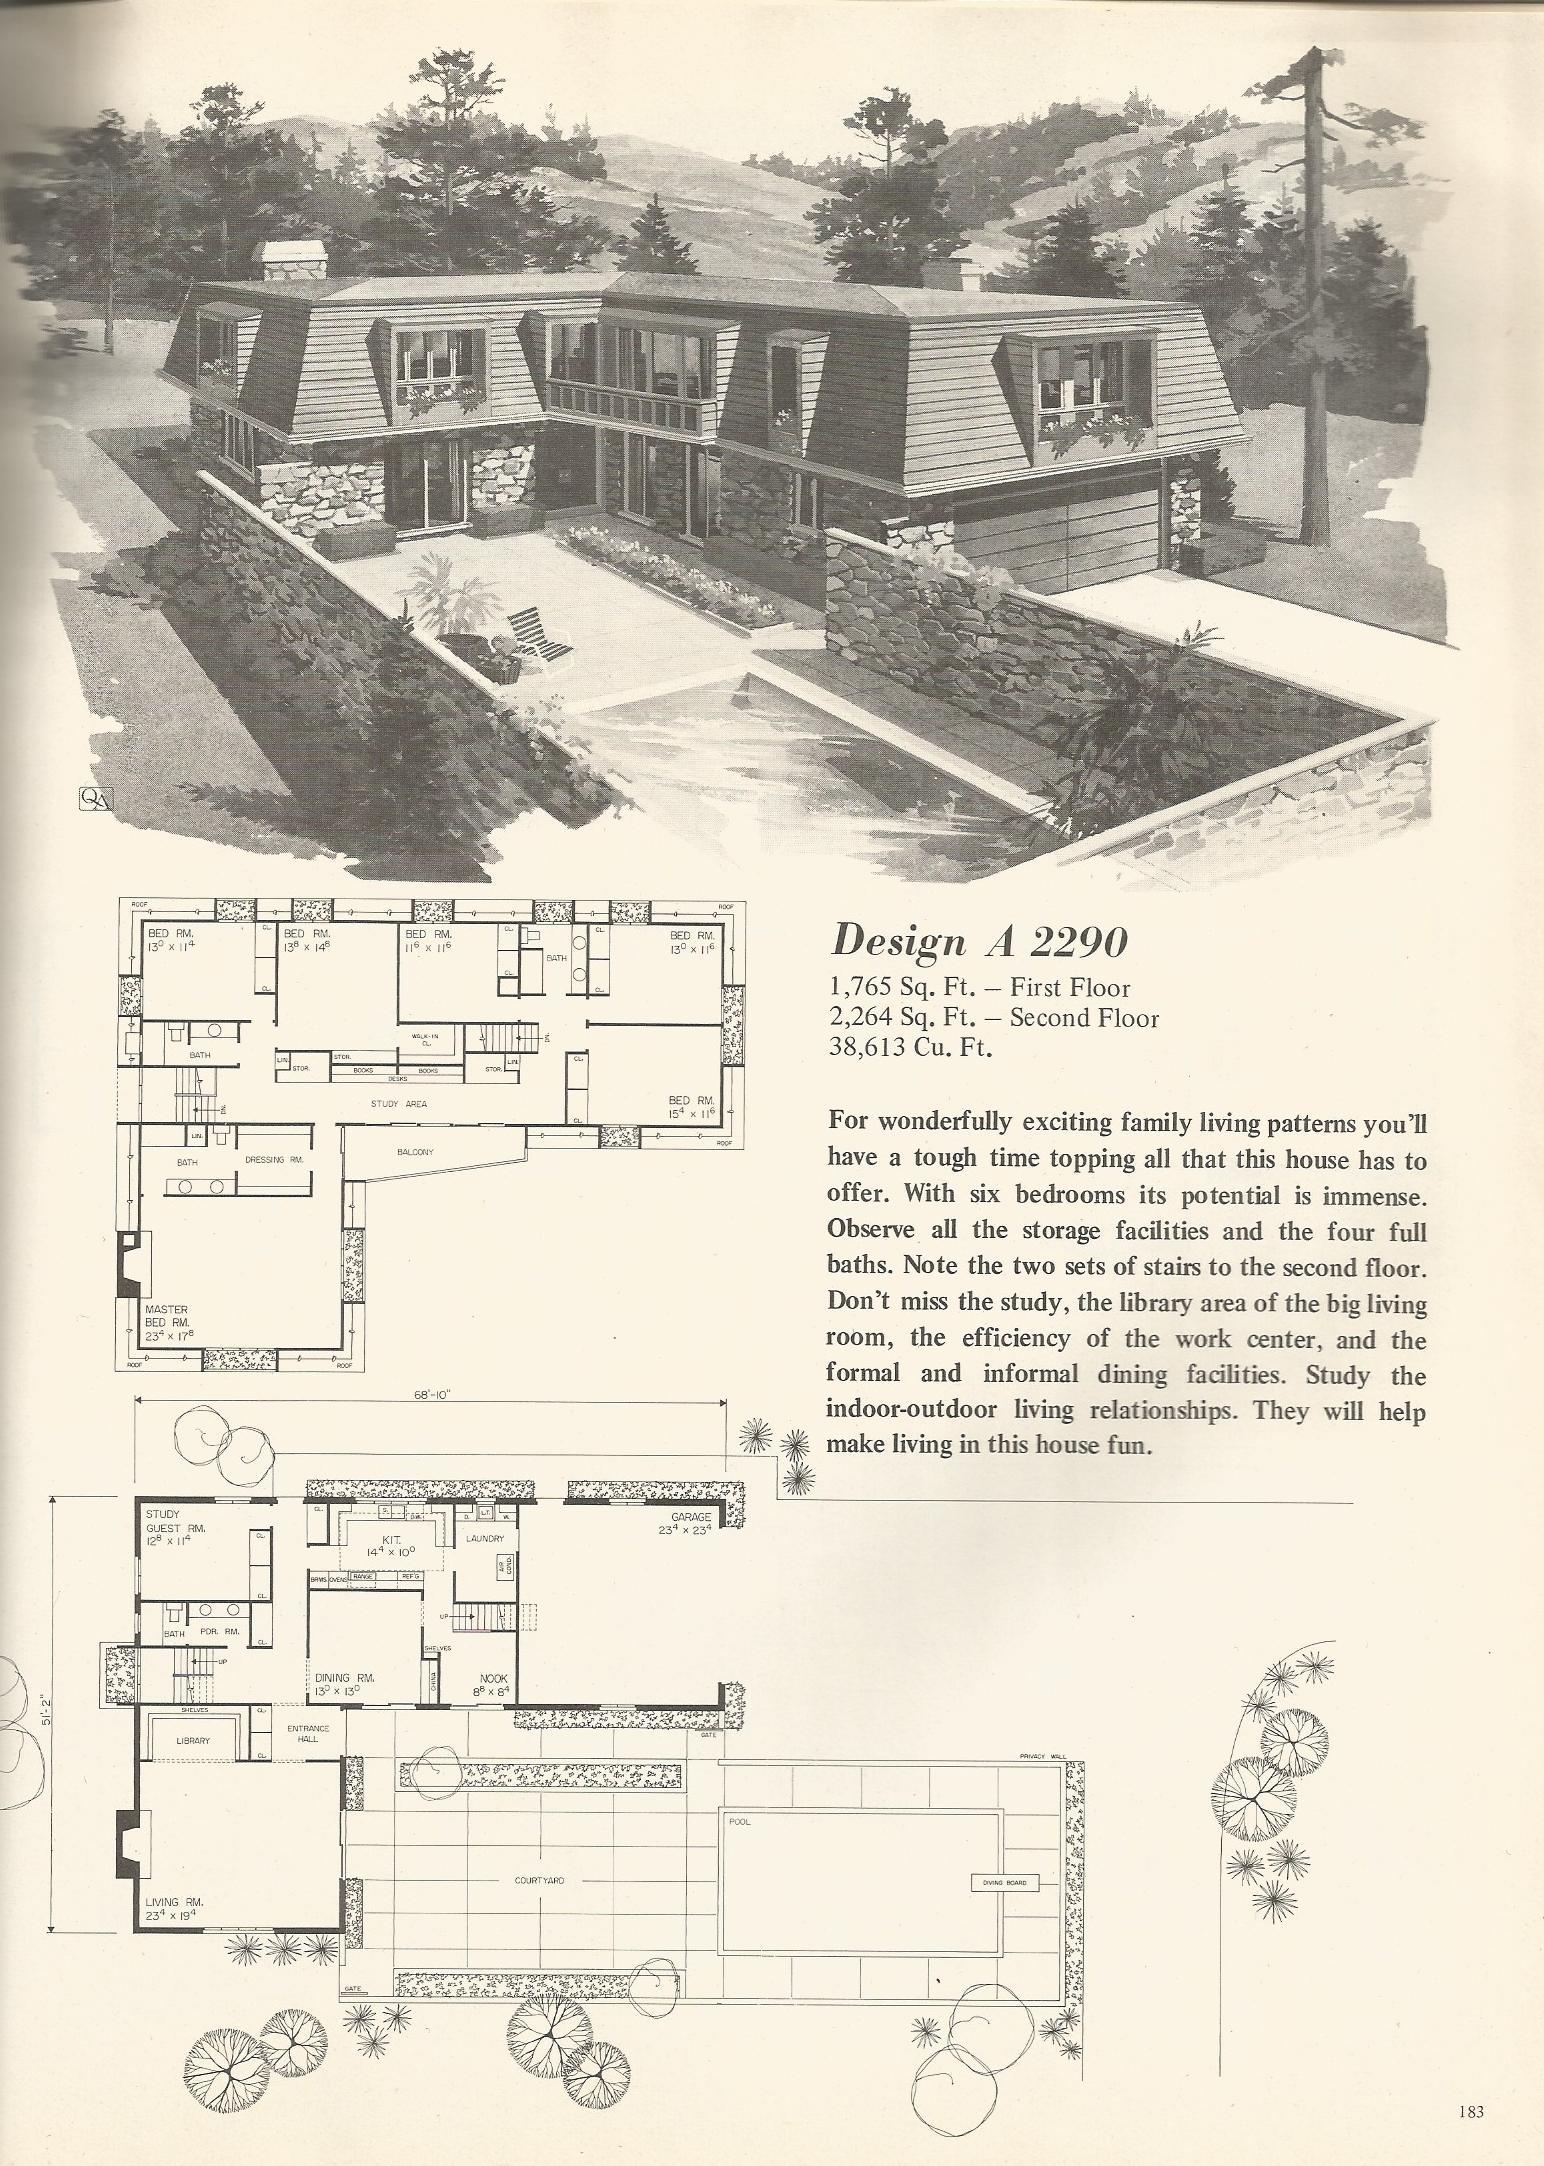 Vintage house plans 2290 antique alter ego for Retro modern house plans